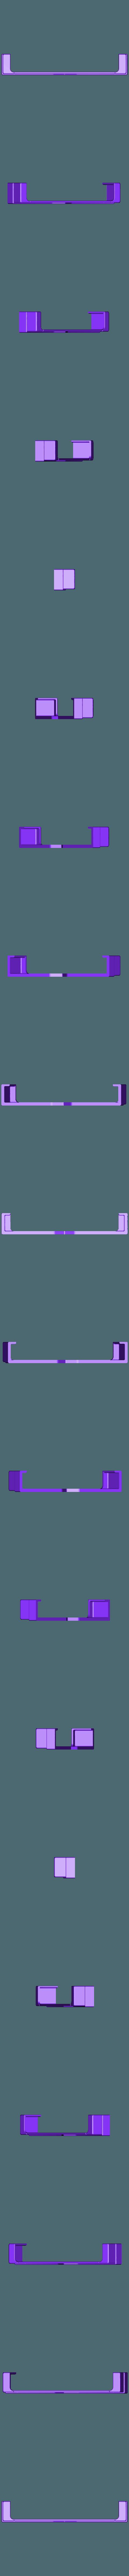 "Case_VirtualBoy.stl Download STL file Nintendo labo vr-kit ""VirtualBoy"" customization accessory • Model to 3D print, Shigeryu"